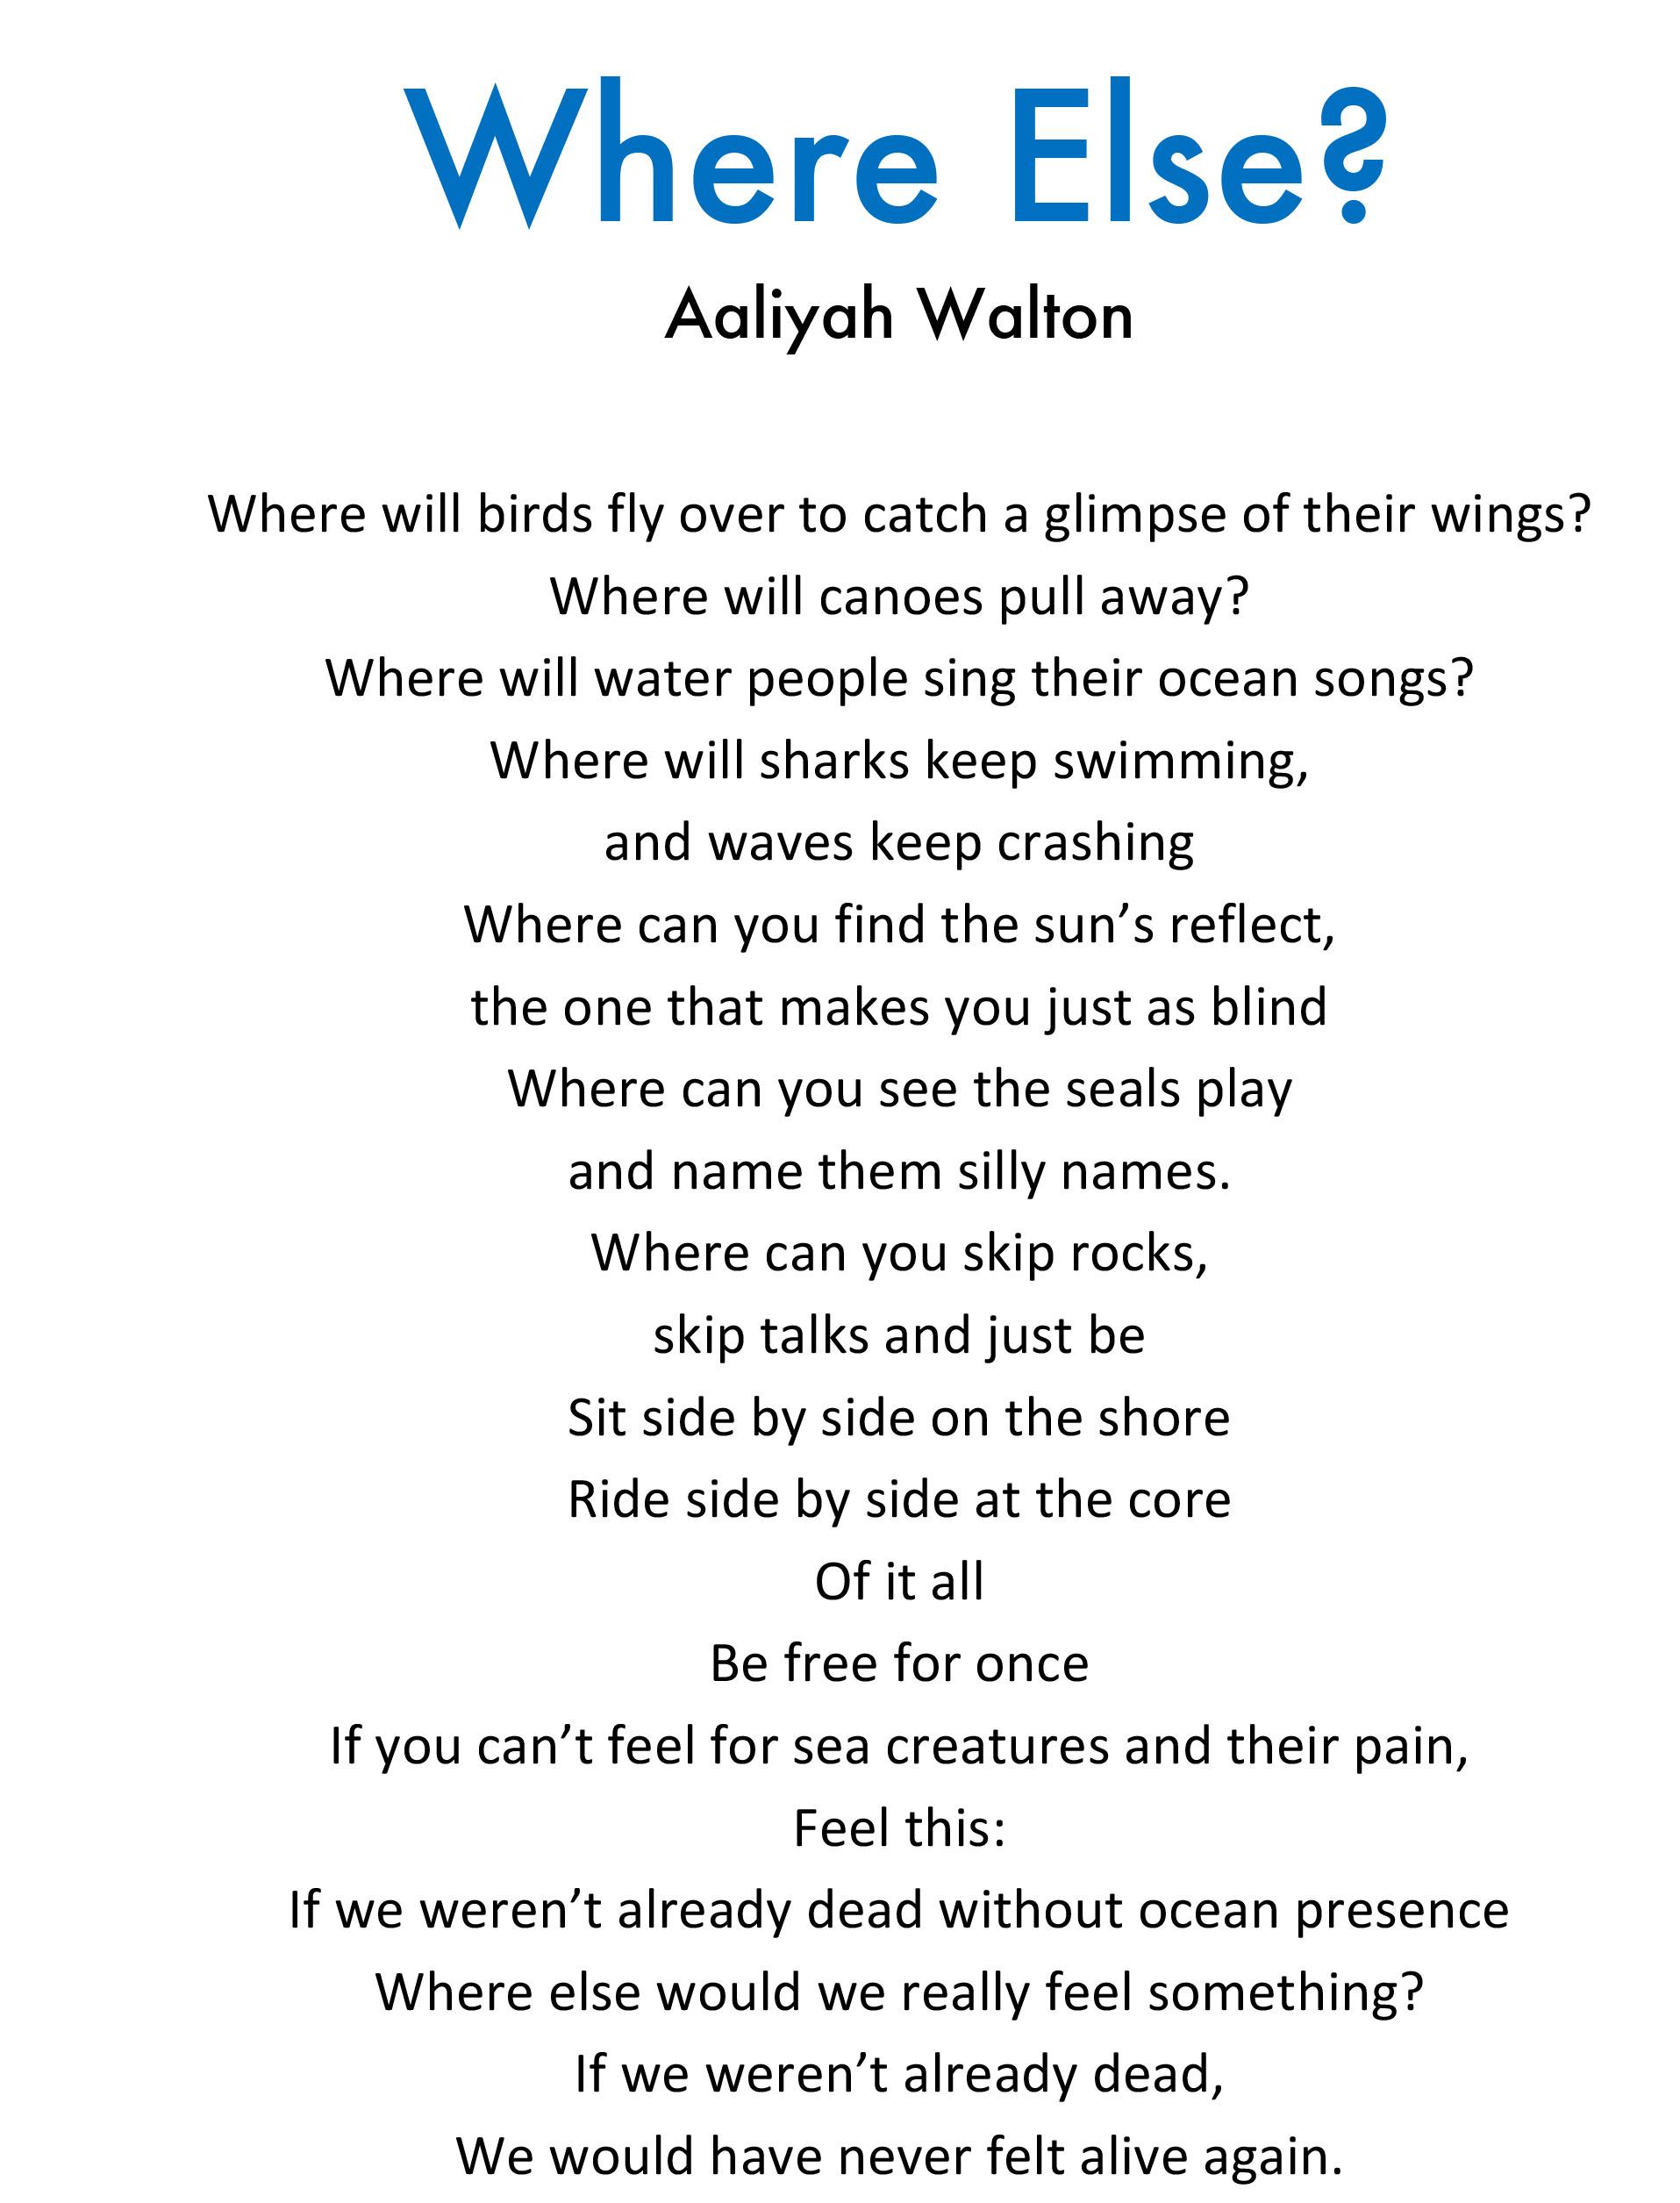 Aaliyah Walton - Where Else